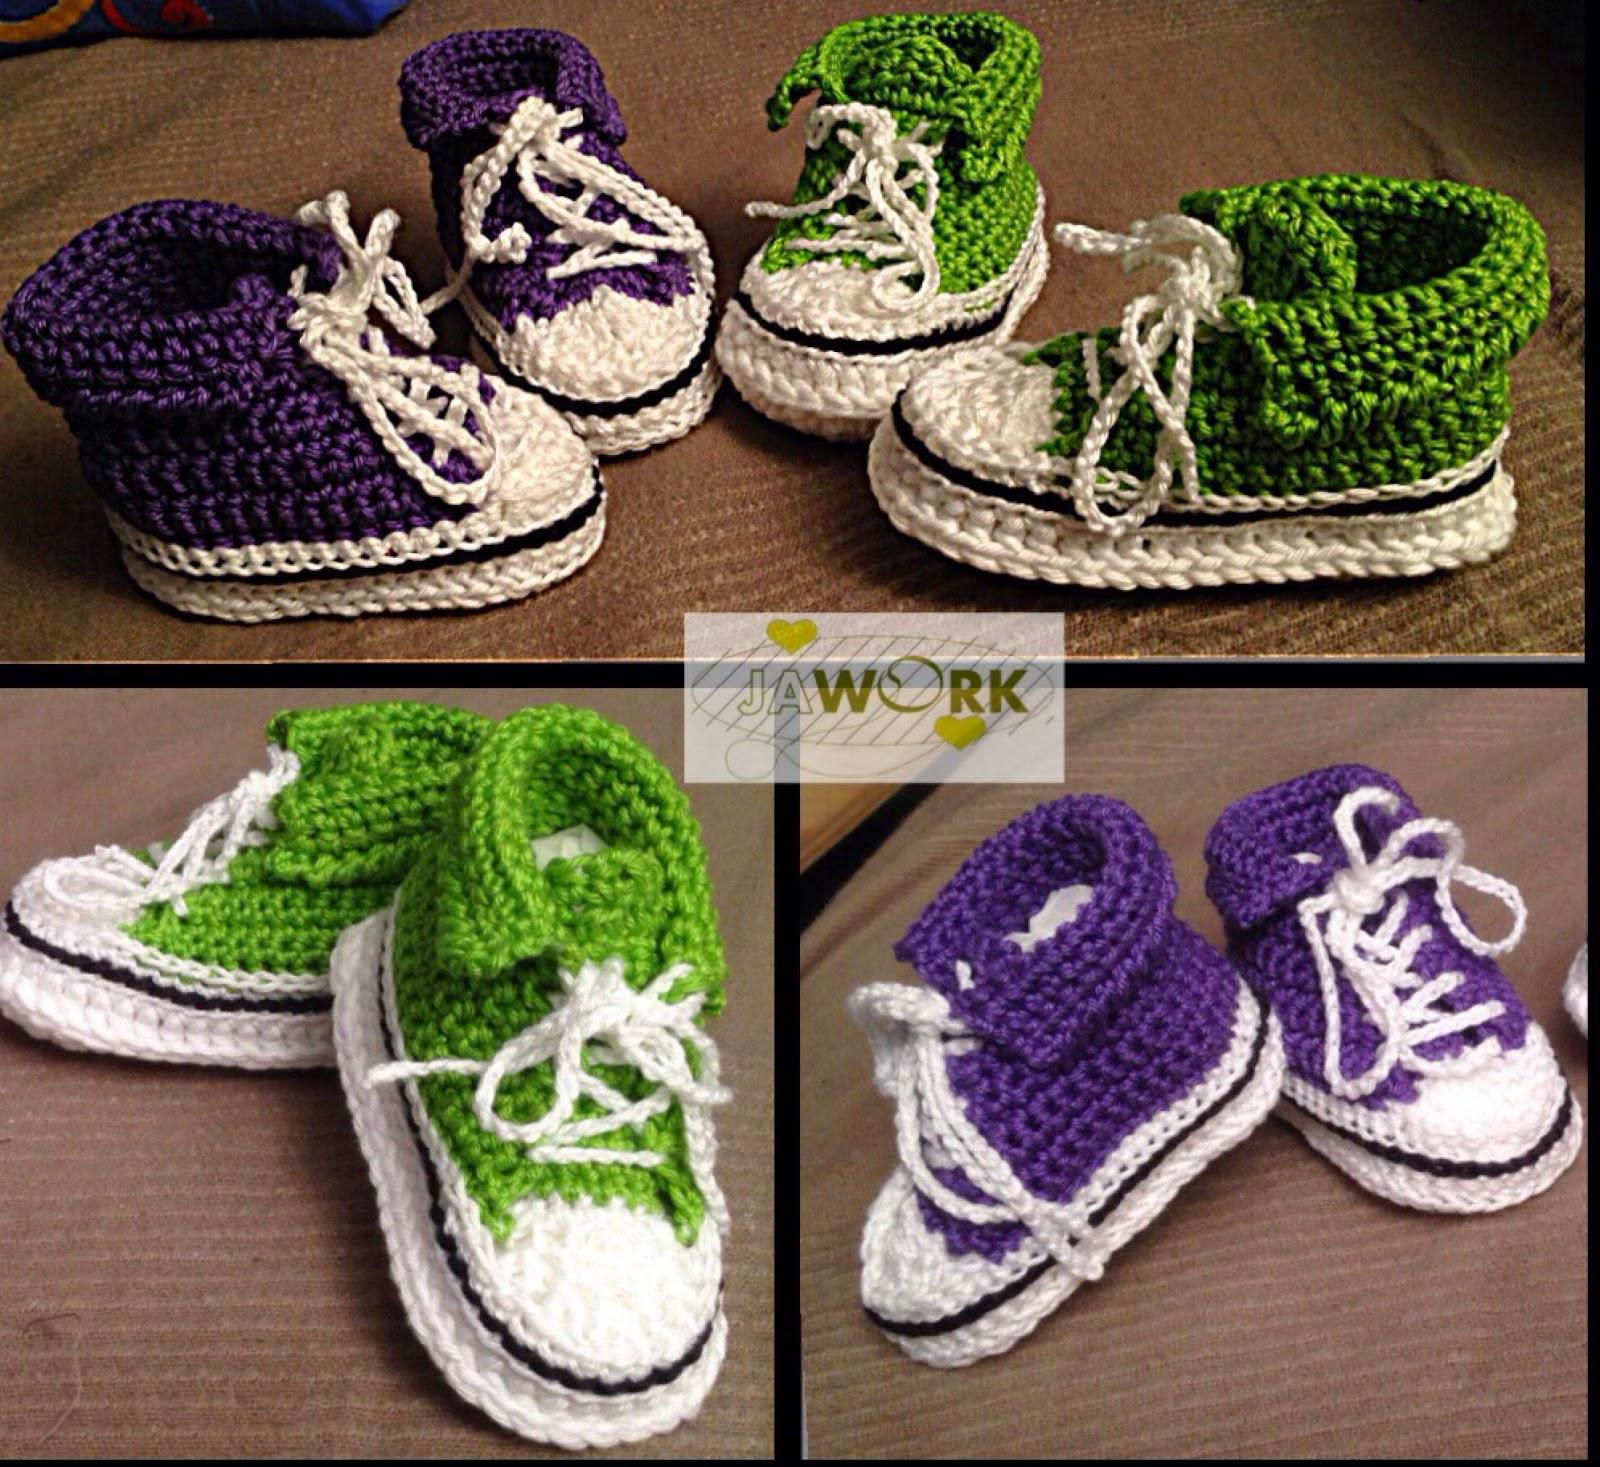 Jawork Handmade With Love Baby Chucks Häkeln